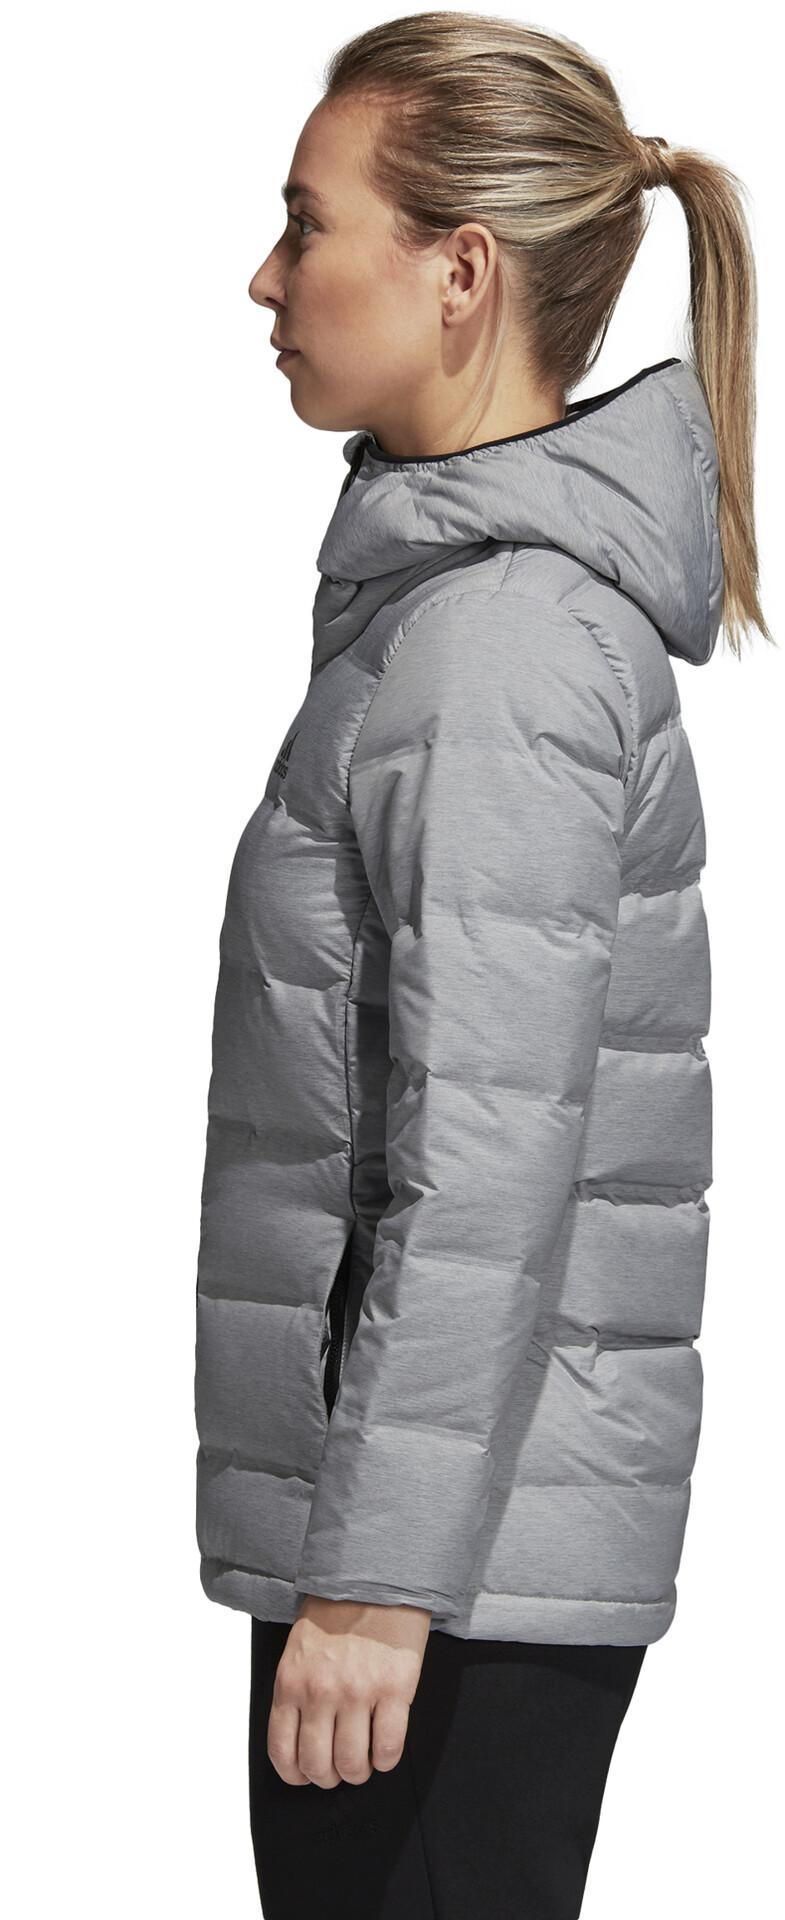 TERREX matte heather Women Hooded Helionic grey Down adidas Jacket dCexBrQoW